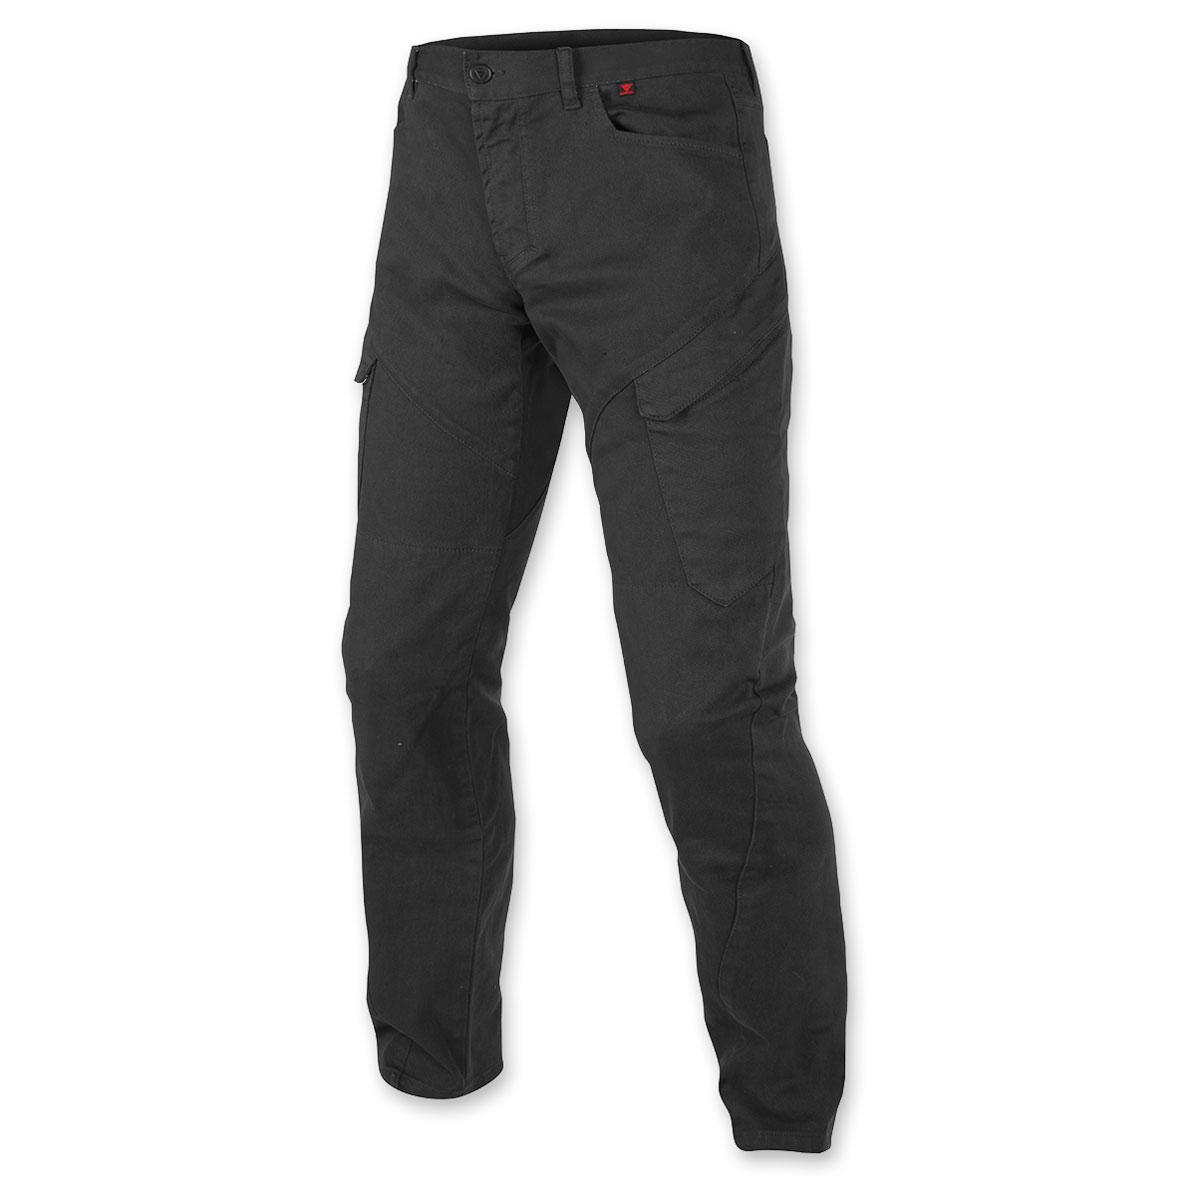 Dainese Men's Kargo Black Pants